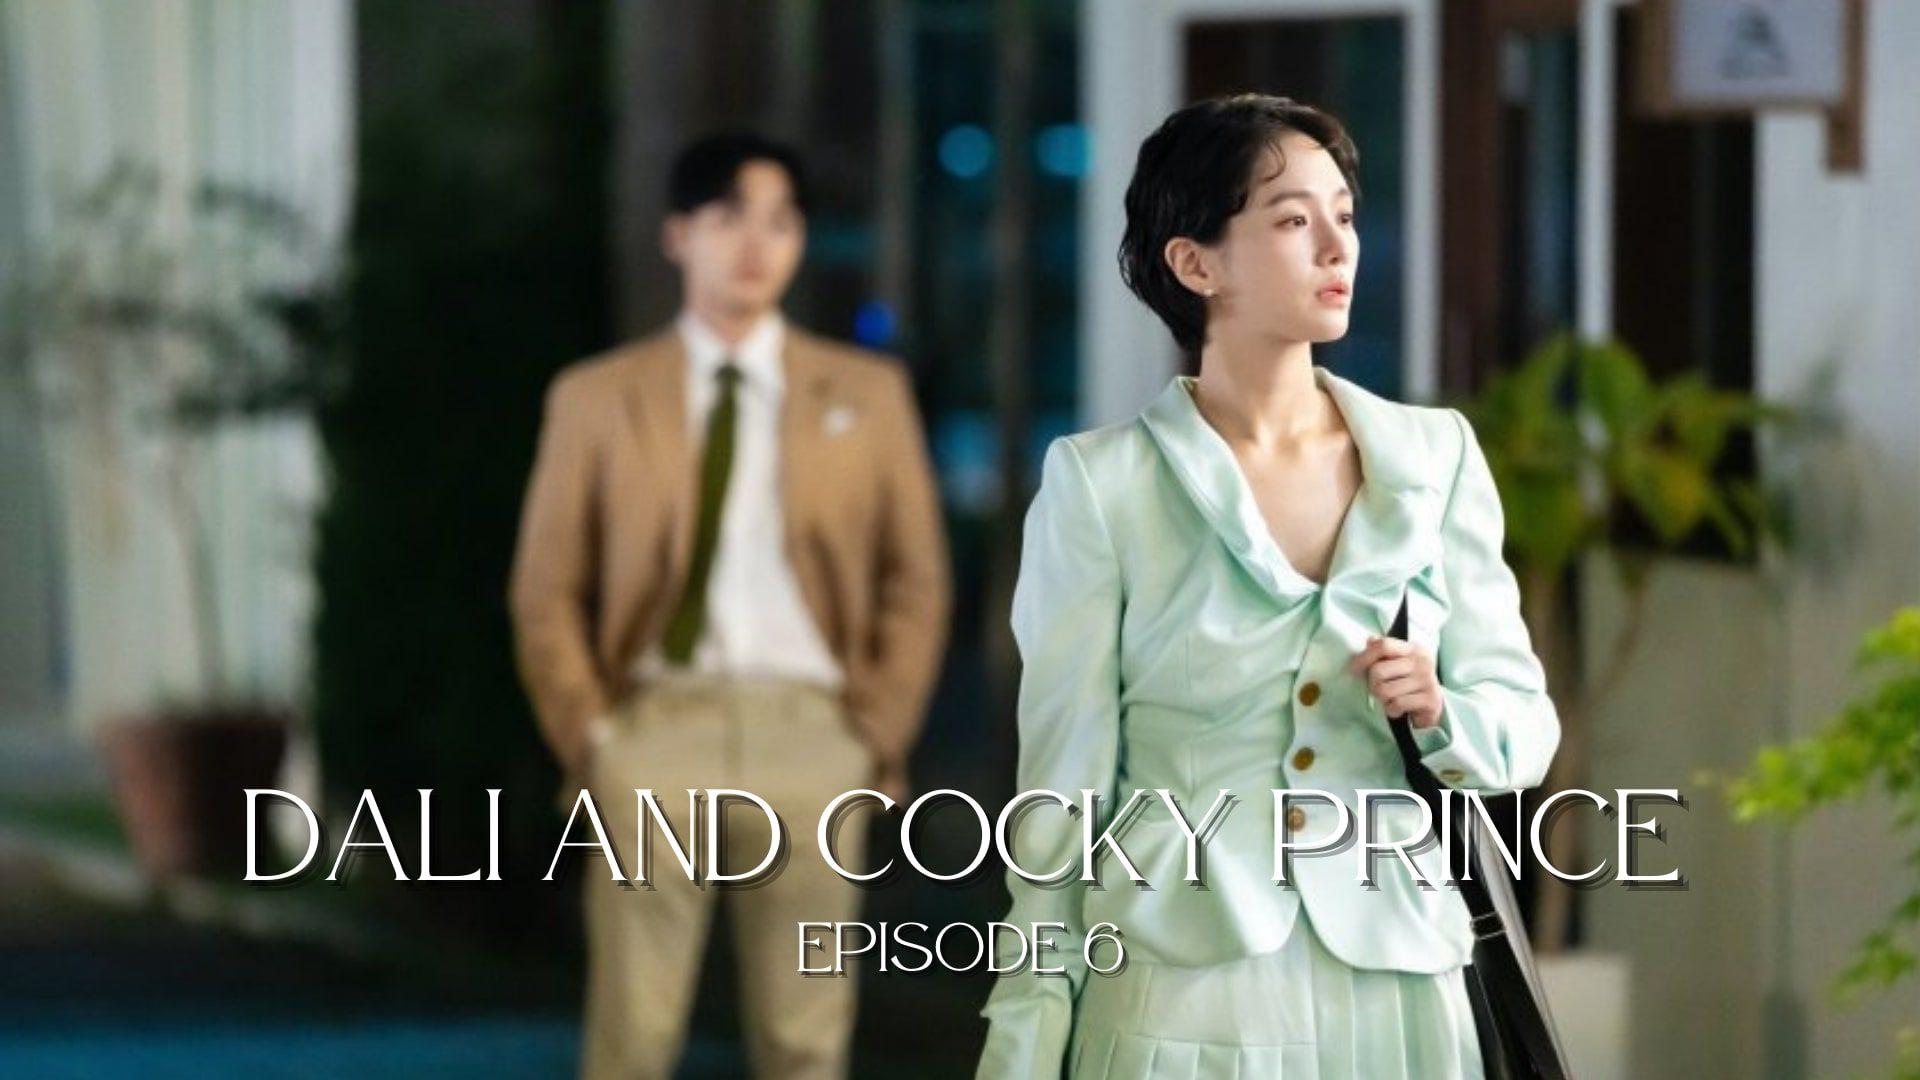 Dali And Cocky Prince Episode 6